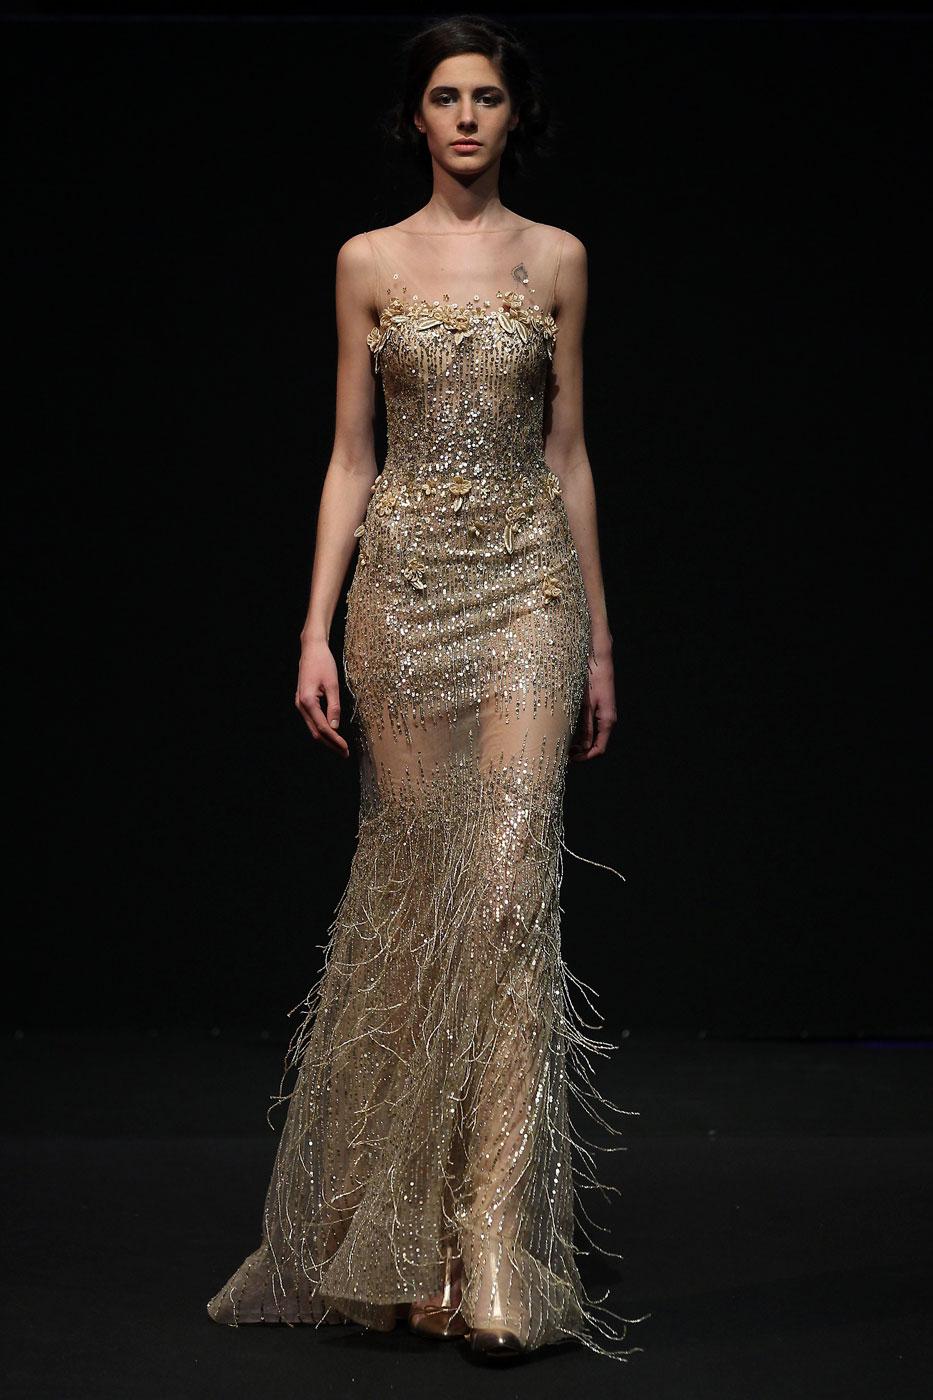 Abed-Mahfouz-fashion-runway-show-haute-couture-paris-spring-2015-the-impression-24